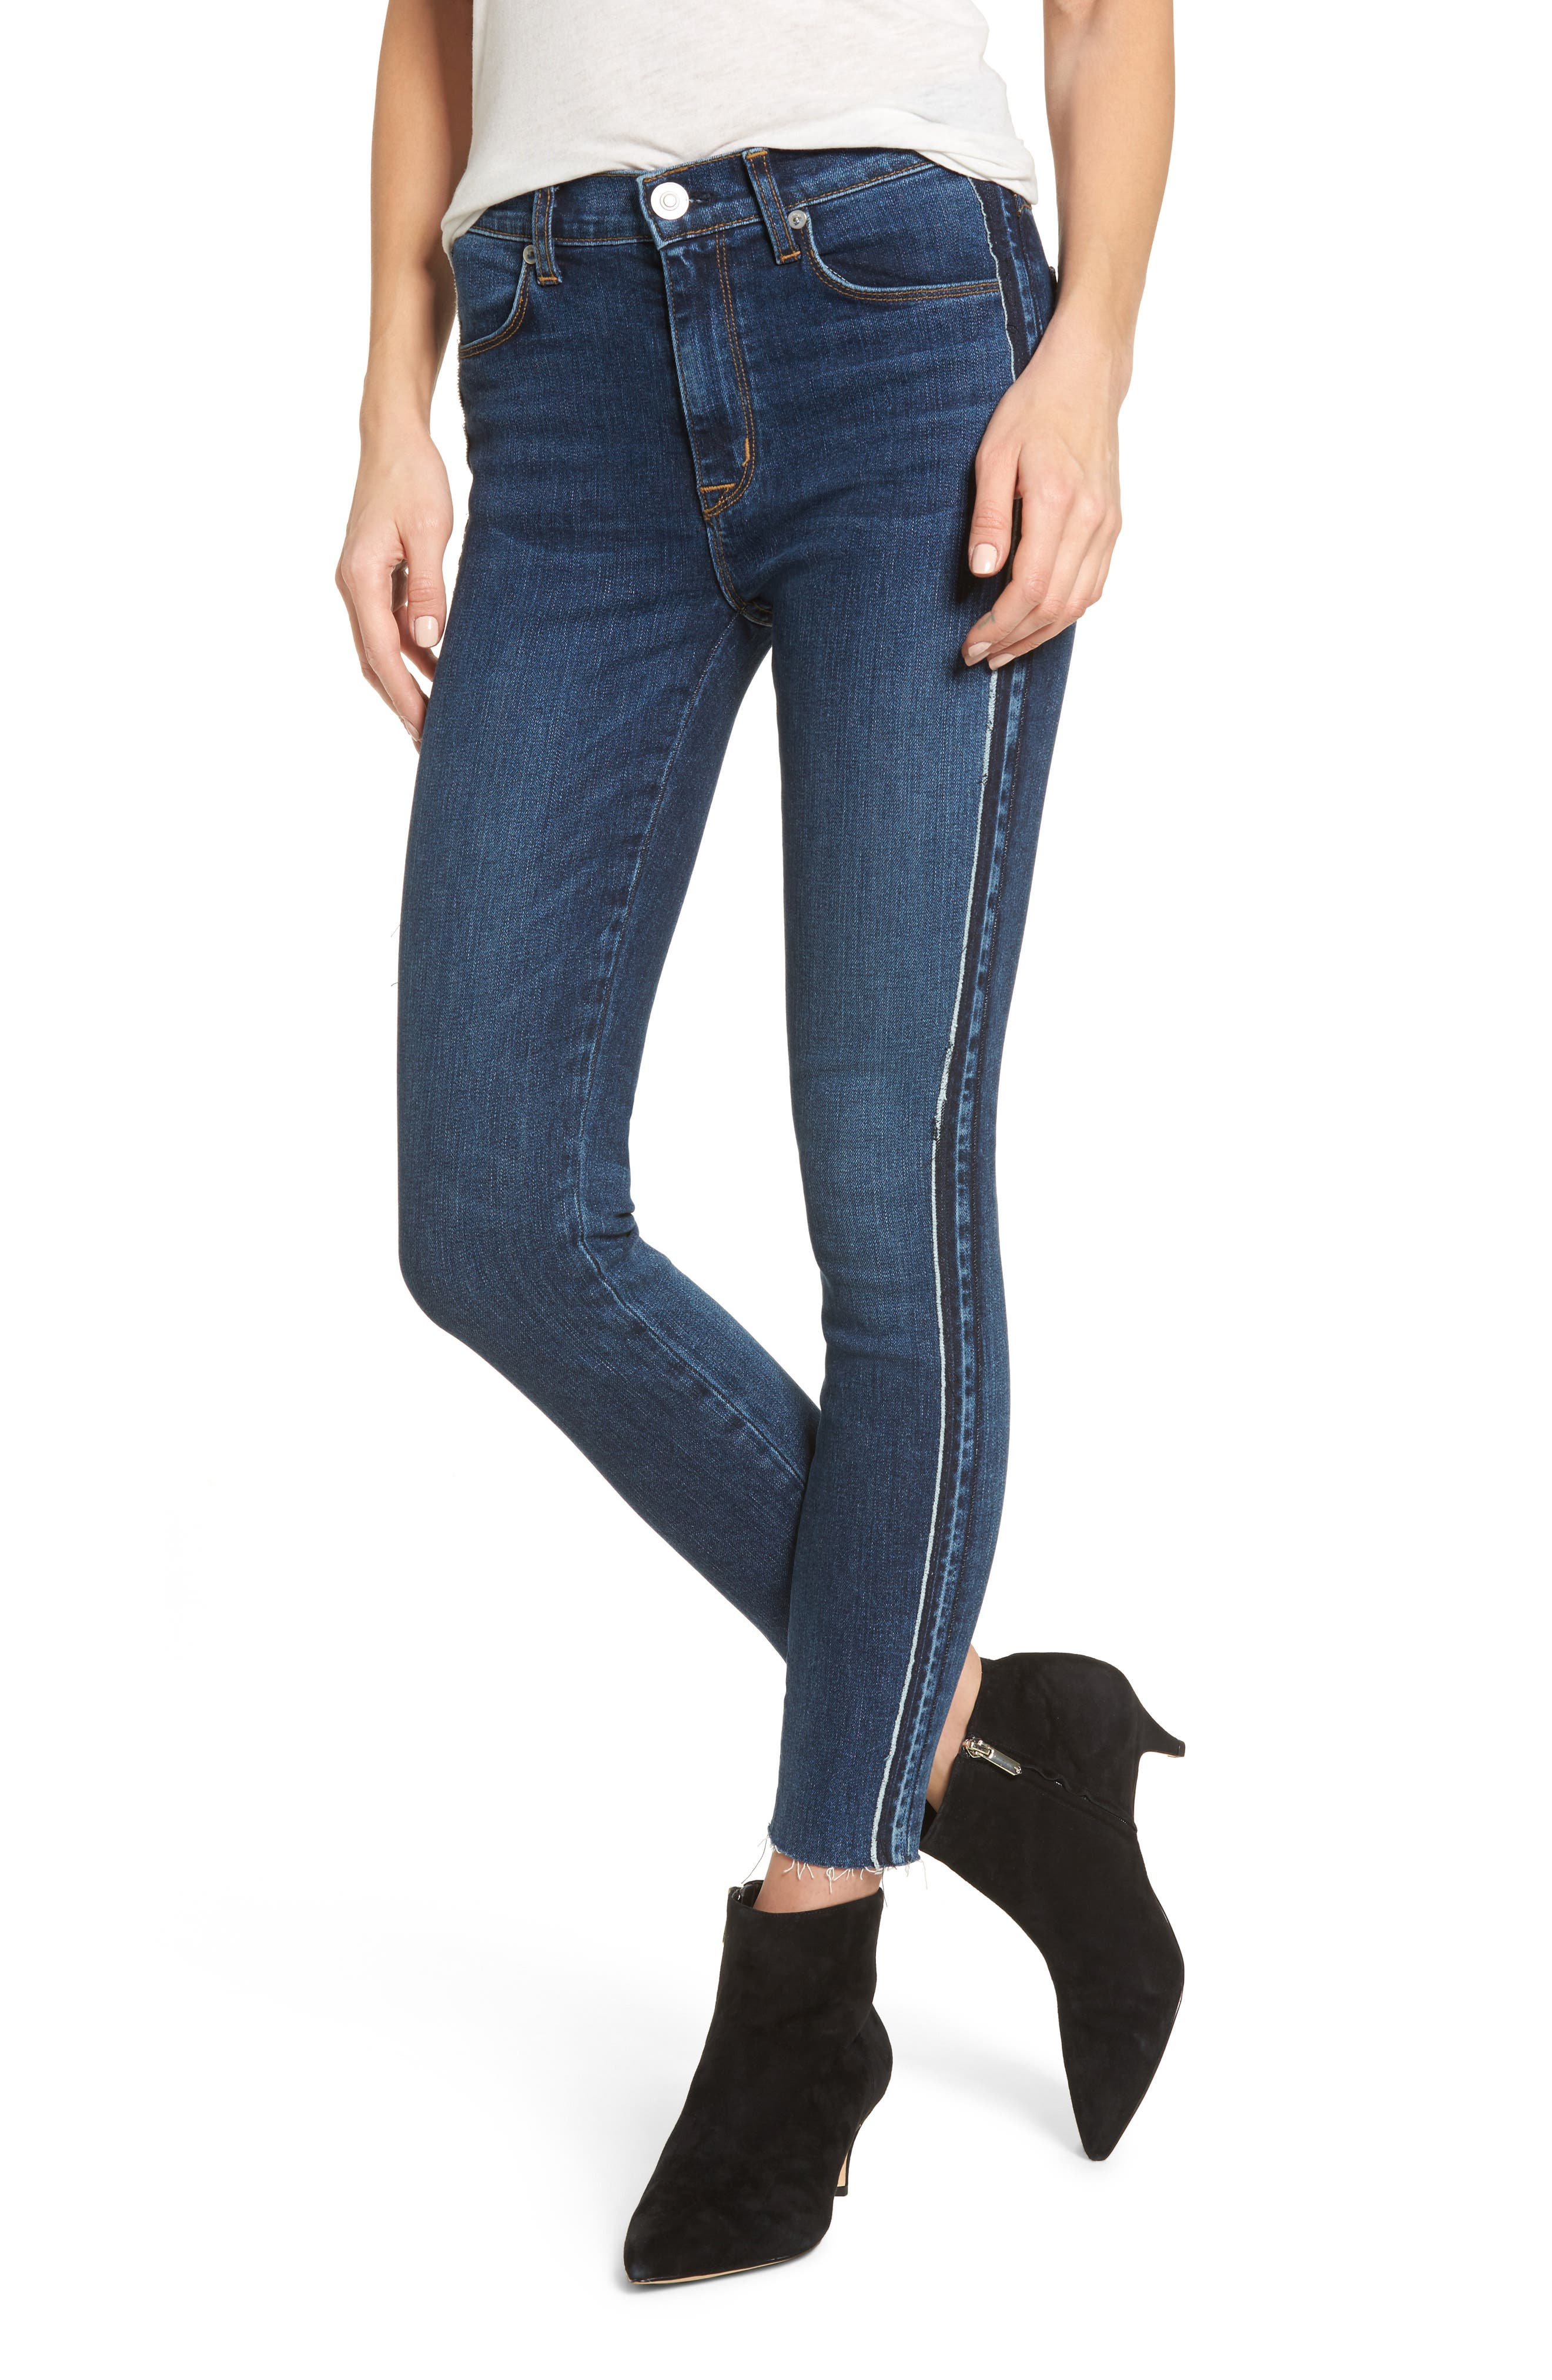 Barbara High Waist Super Skinny Jeans,                             Main thumbnail 1, color,                             Fatal